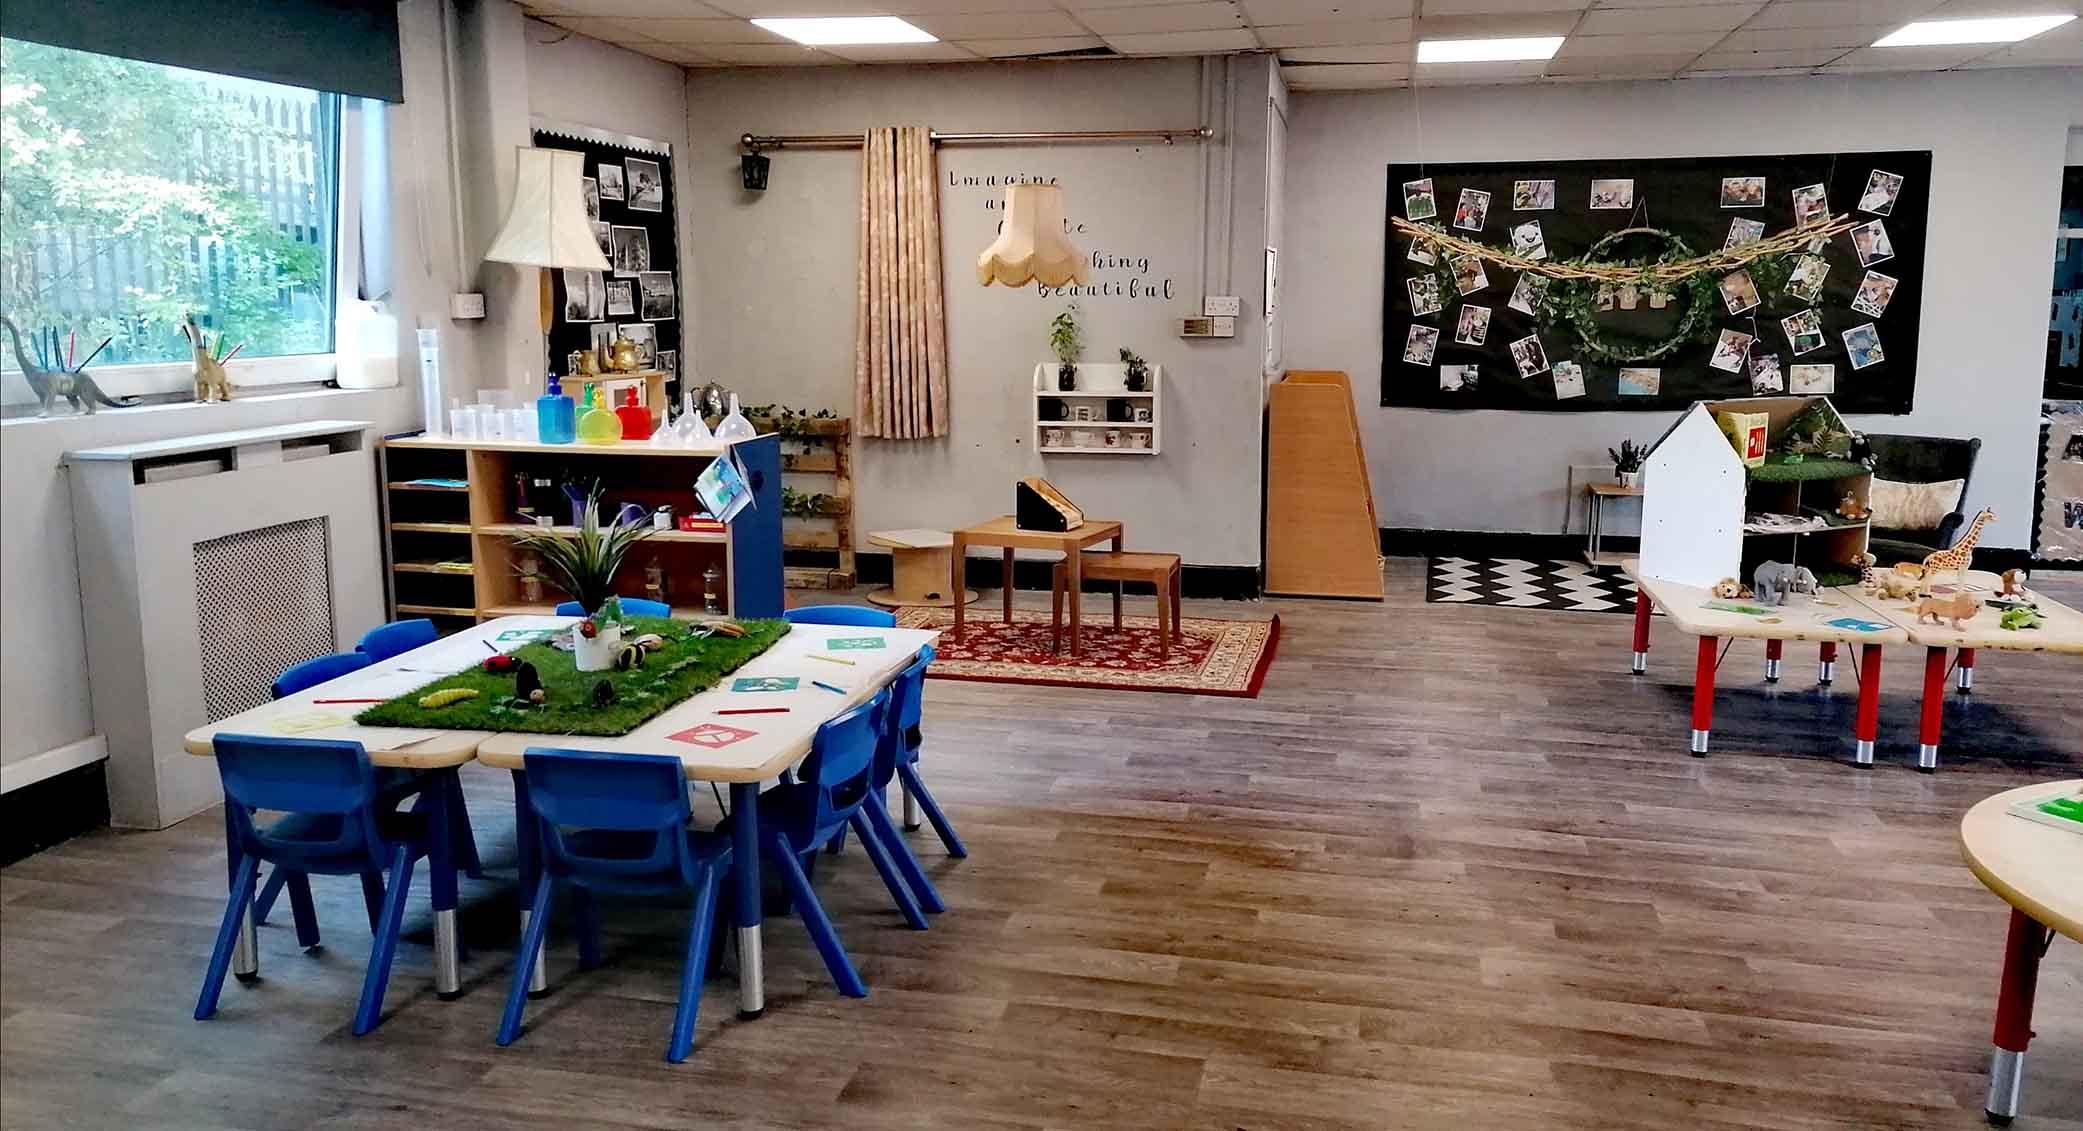 Little Owls – St. Bede's Childcare Limited